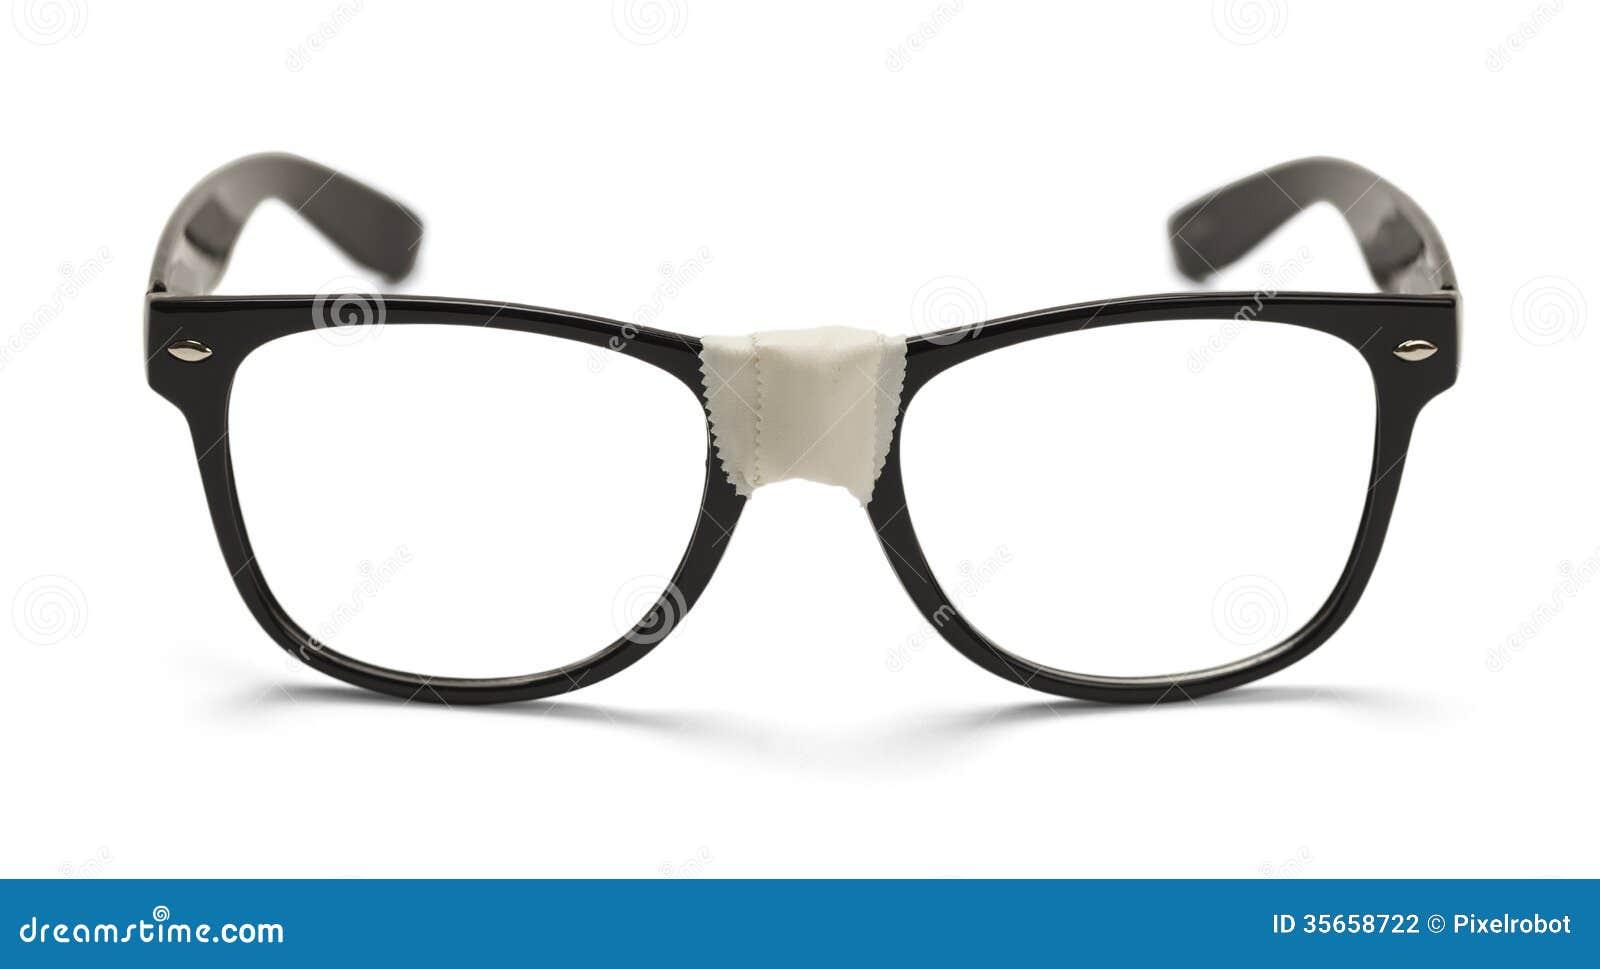 5d6dd8e730f Black Nerd Glasses stock photo. Image of photography - 35658722